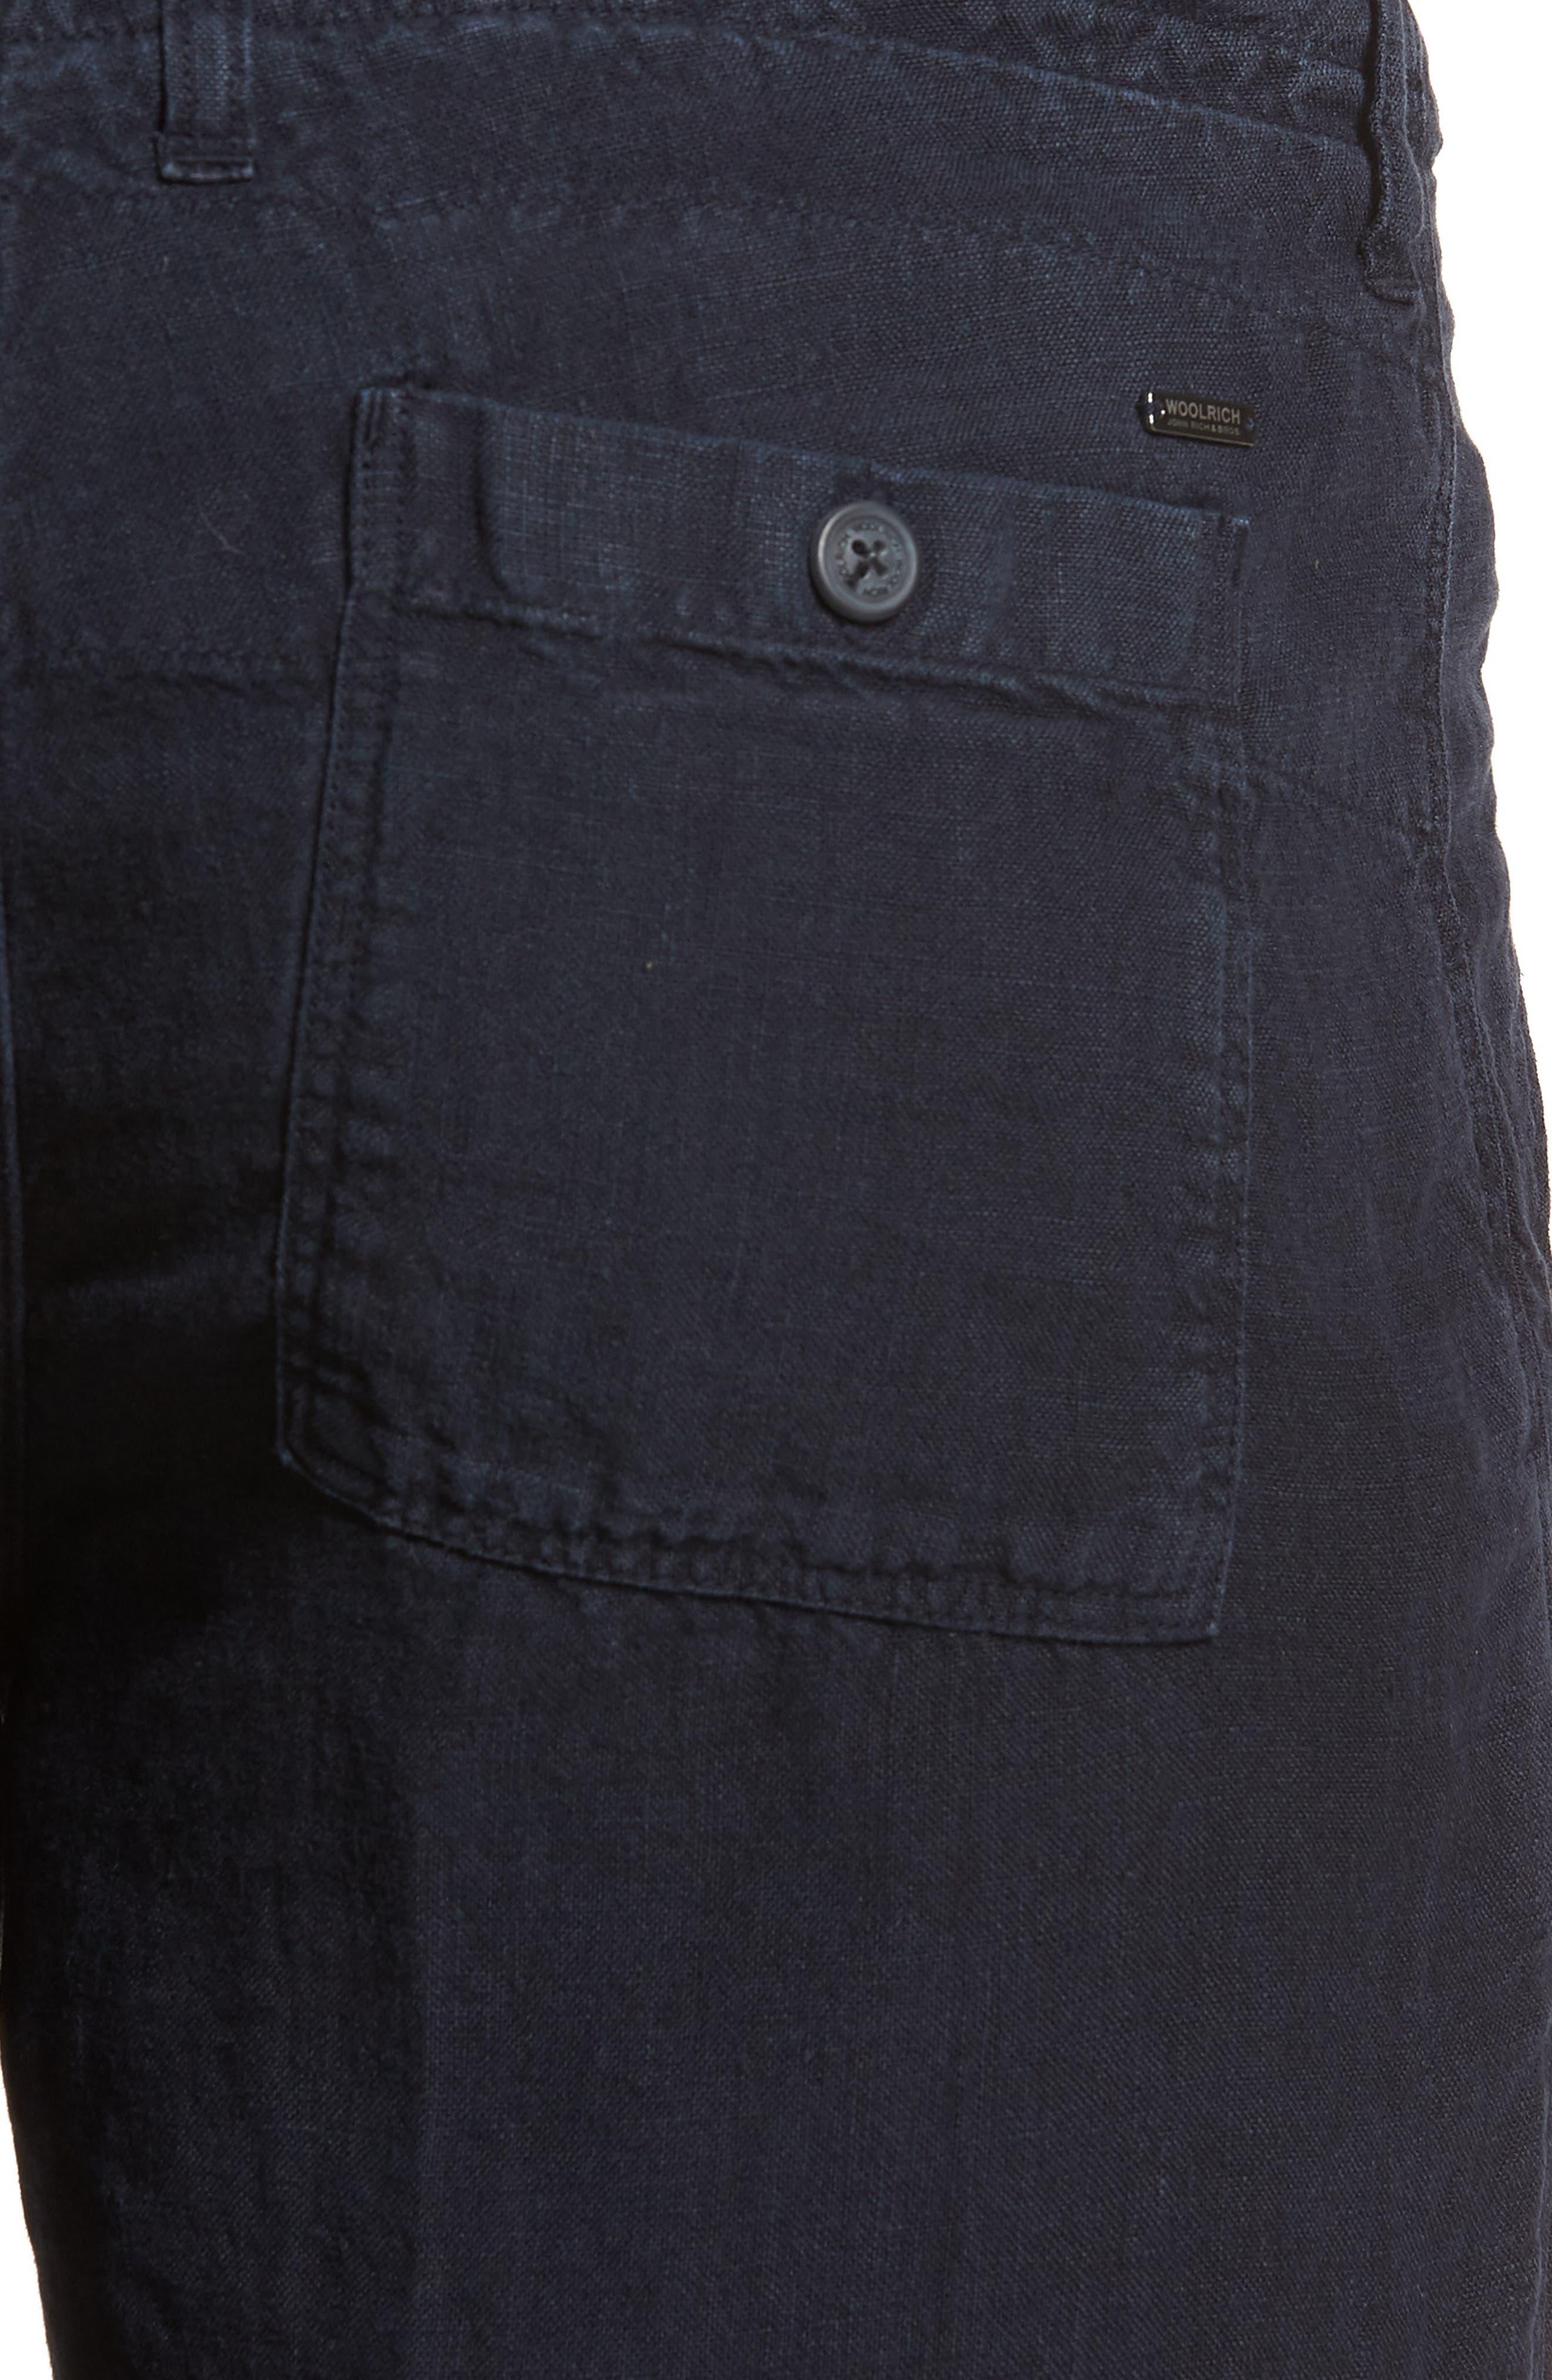 & Bros. Linen Shorts,                             Alternate thumbnail 4, color,                             Alpine Navy